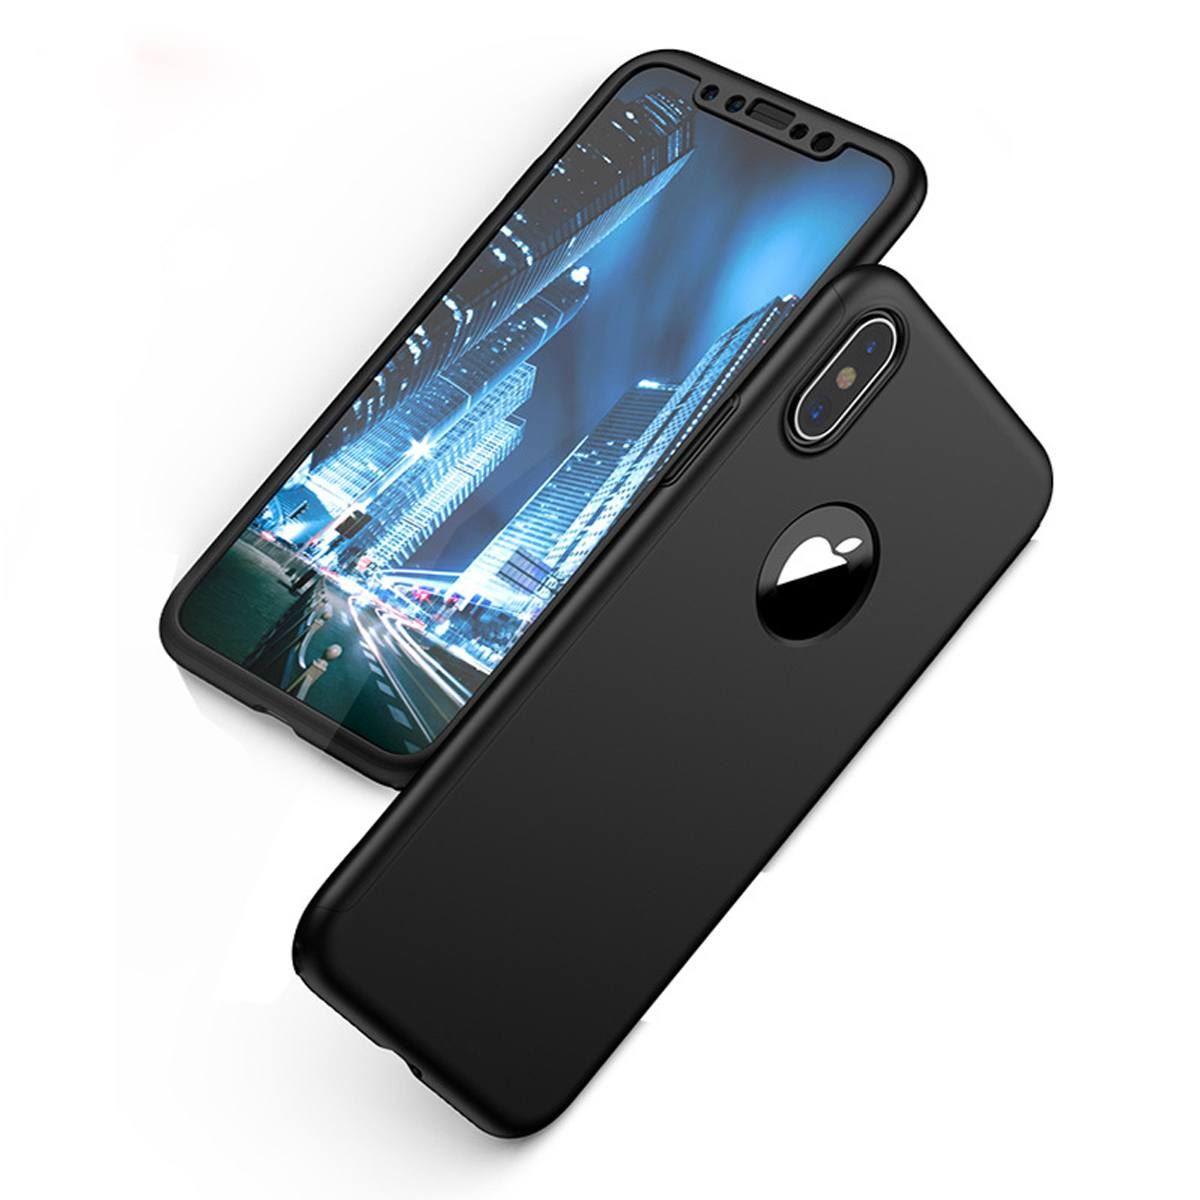 For-Apple-iPhone-XS-Max-XR-Hybrid-360-Slim-Ultra-Thin-Heavy-Duty-Shockproof-Case Indexbild 12